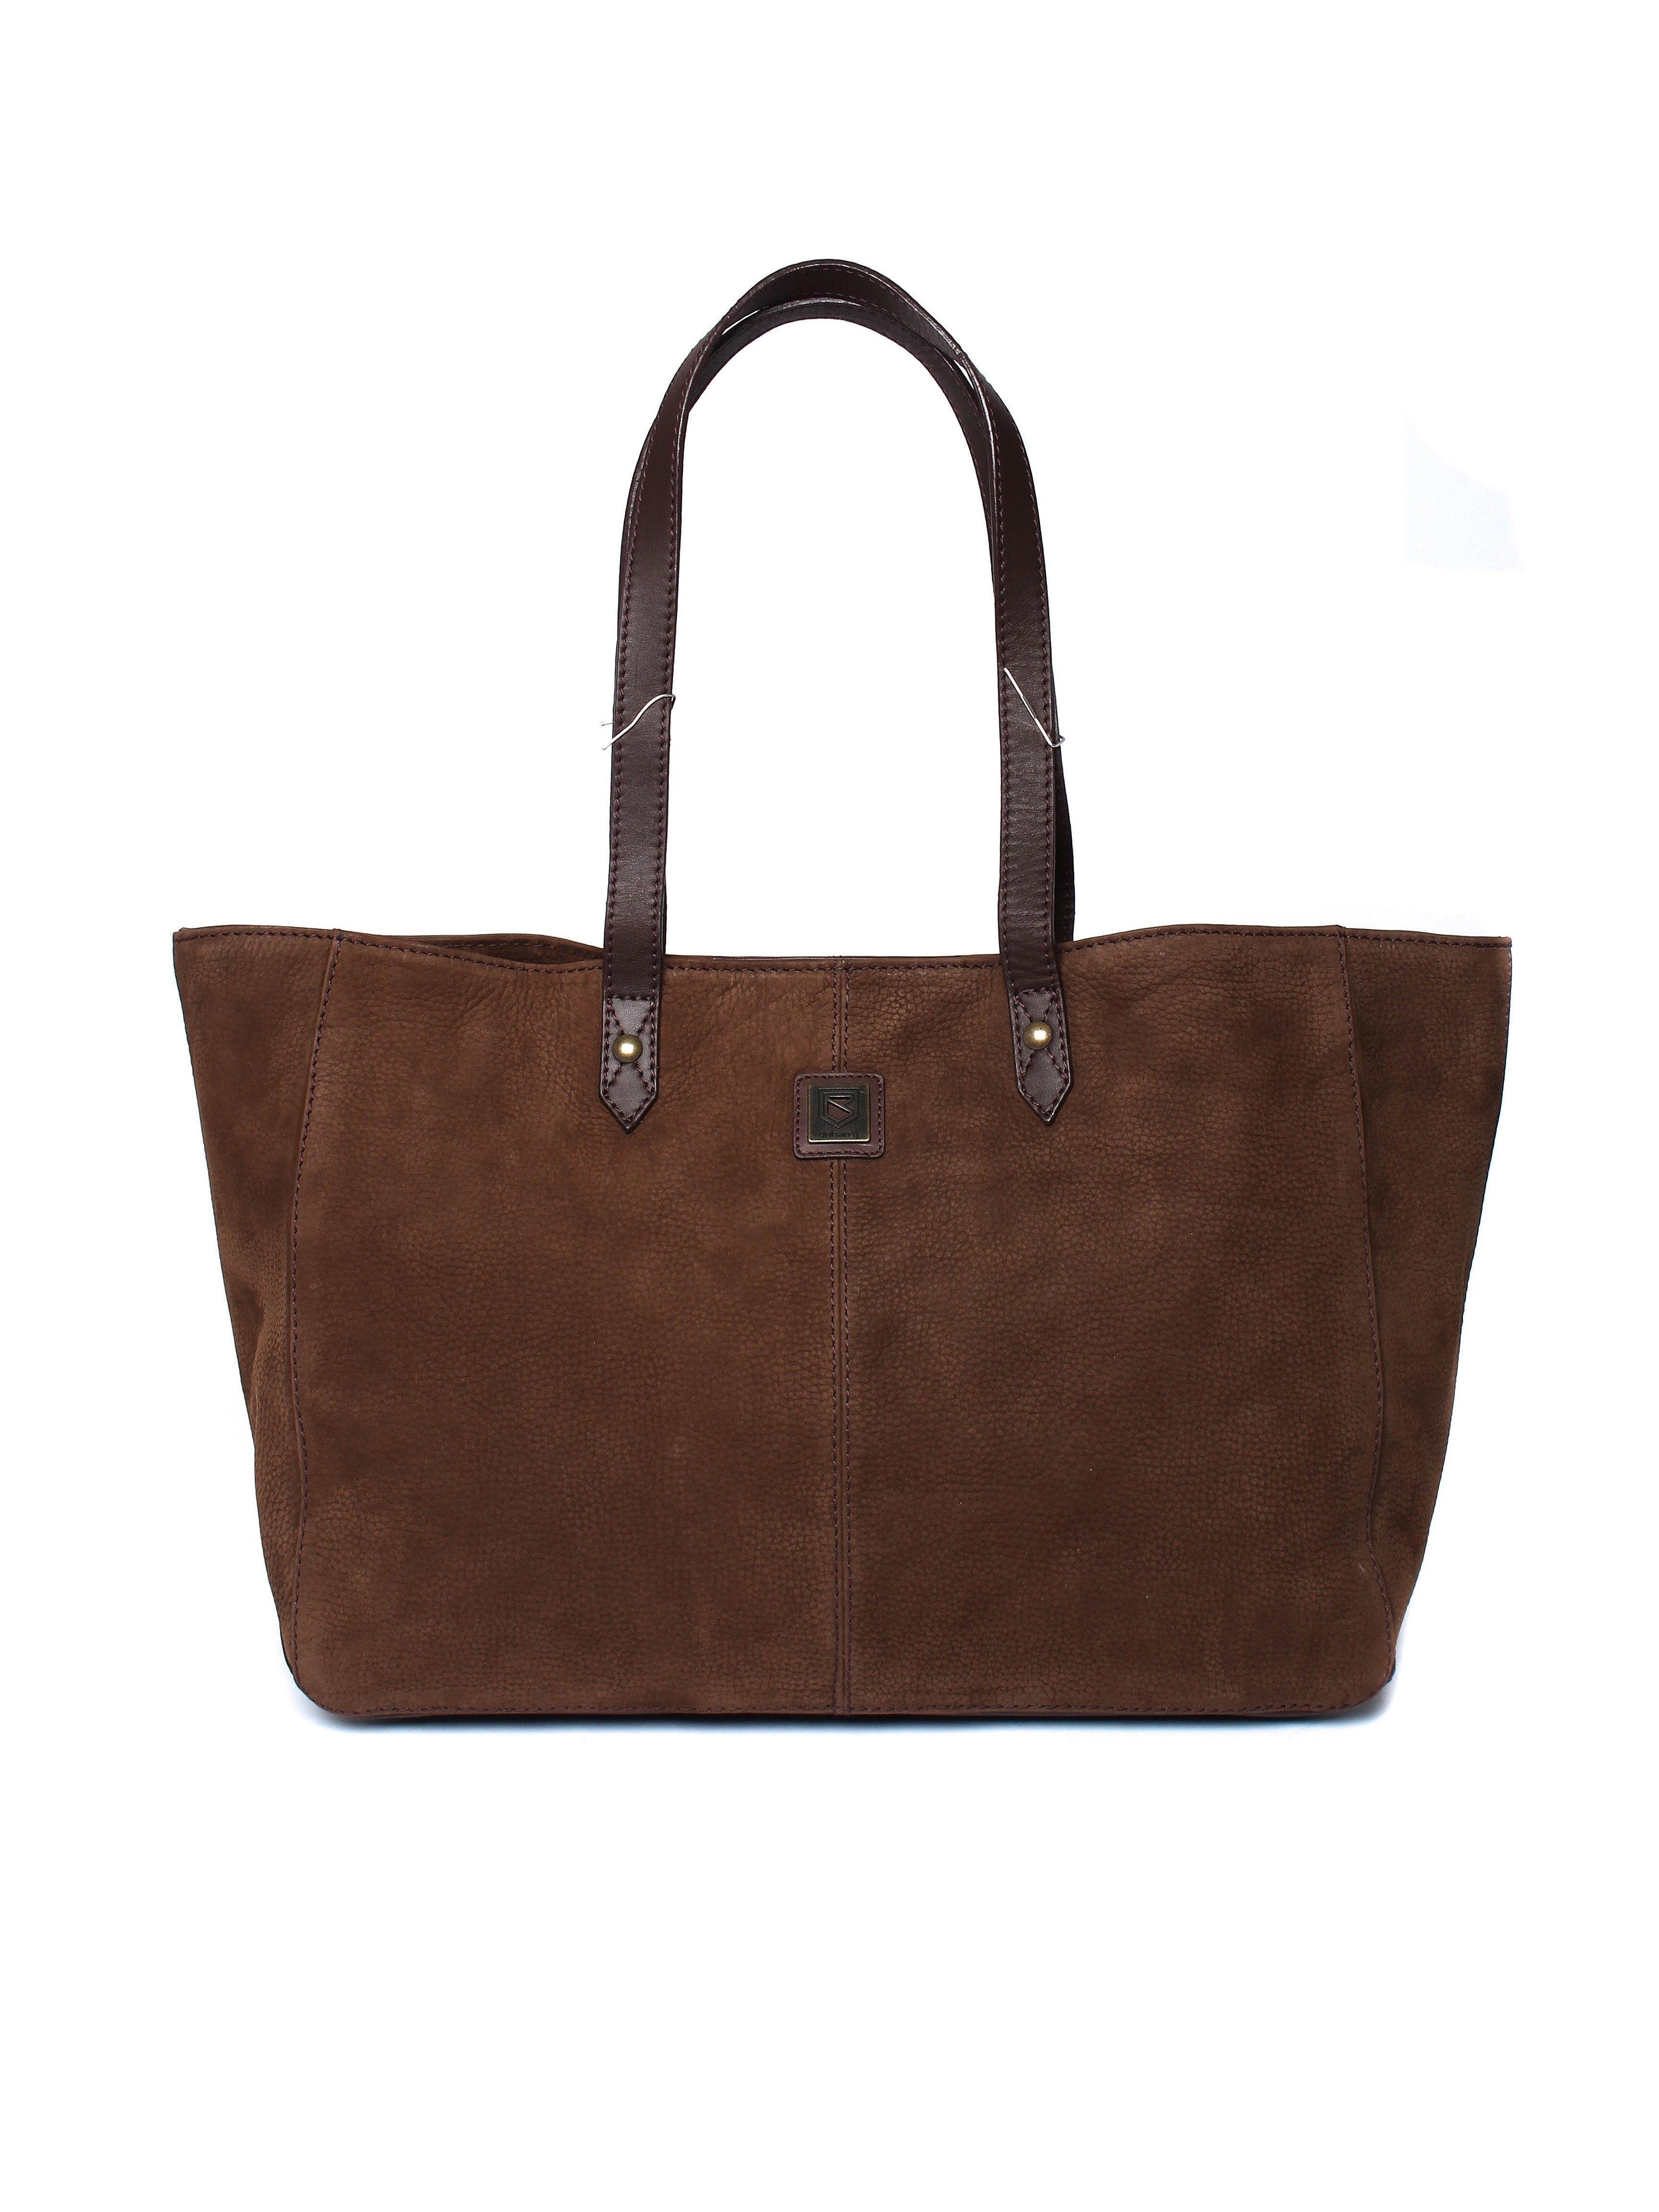 Dubarry Women's Baltinglass Tote Bag - Walnut Leather